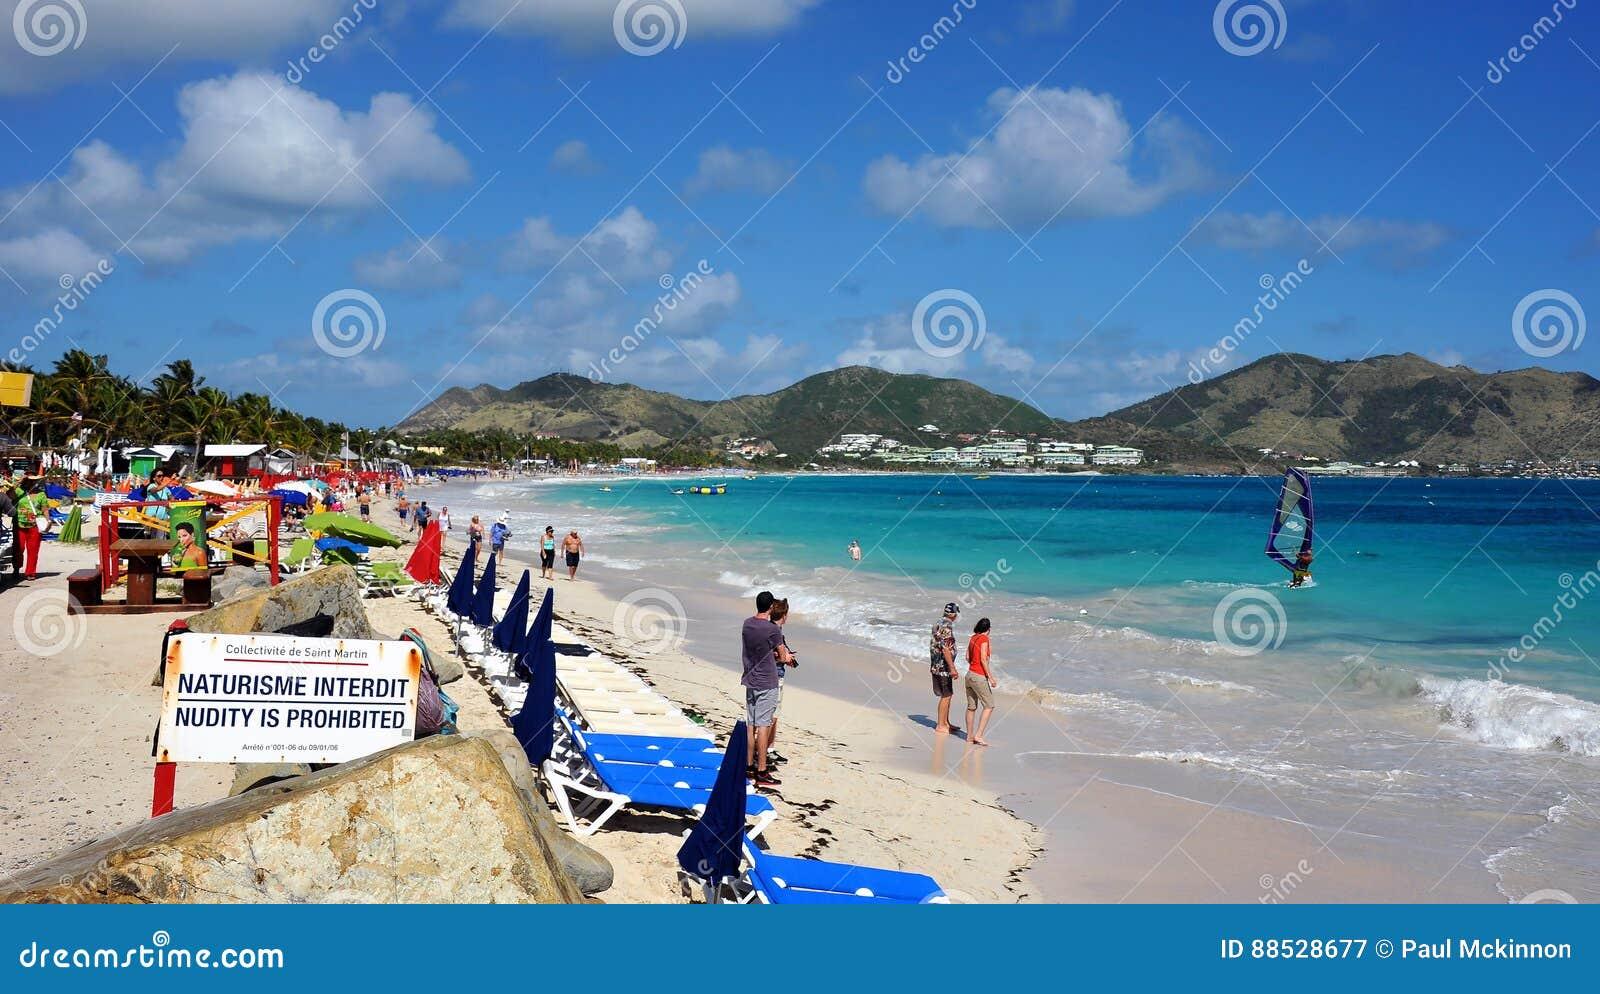 Will Nude orient beach vacation regret